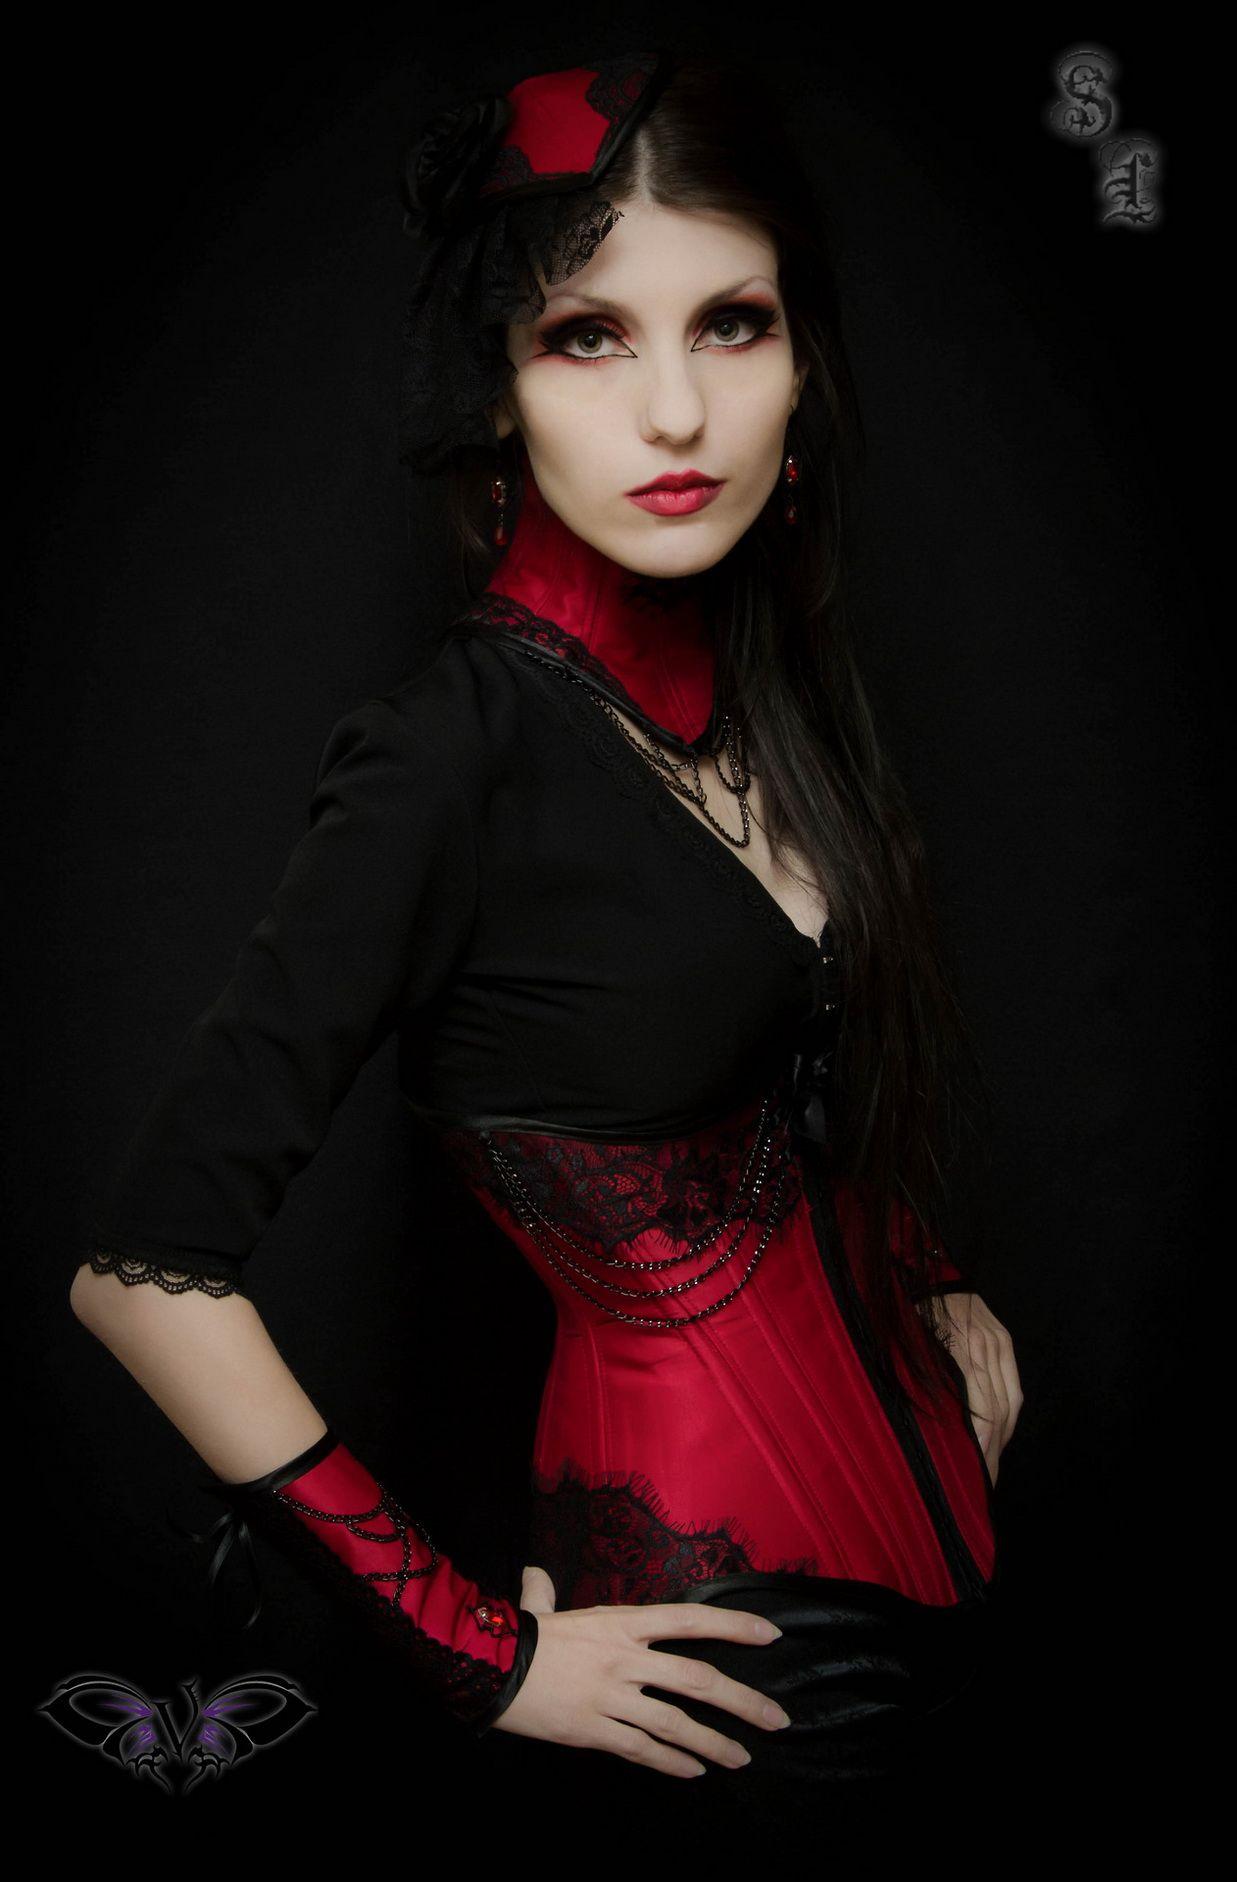 Victorian goth victoriangothtumblr dark lady